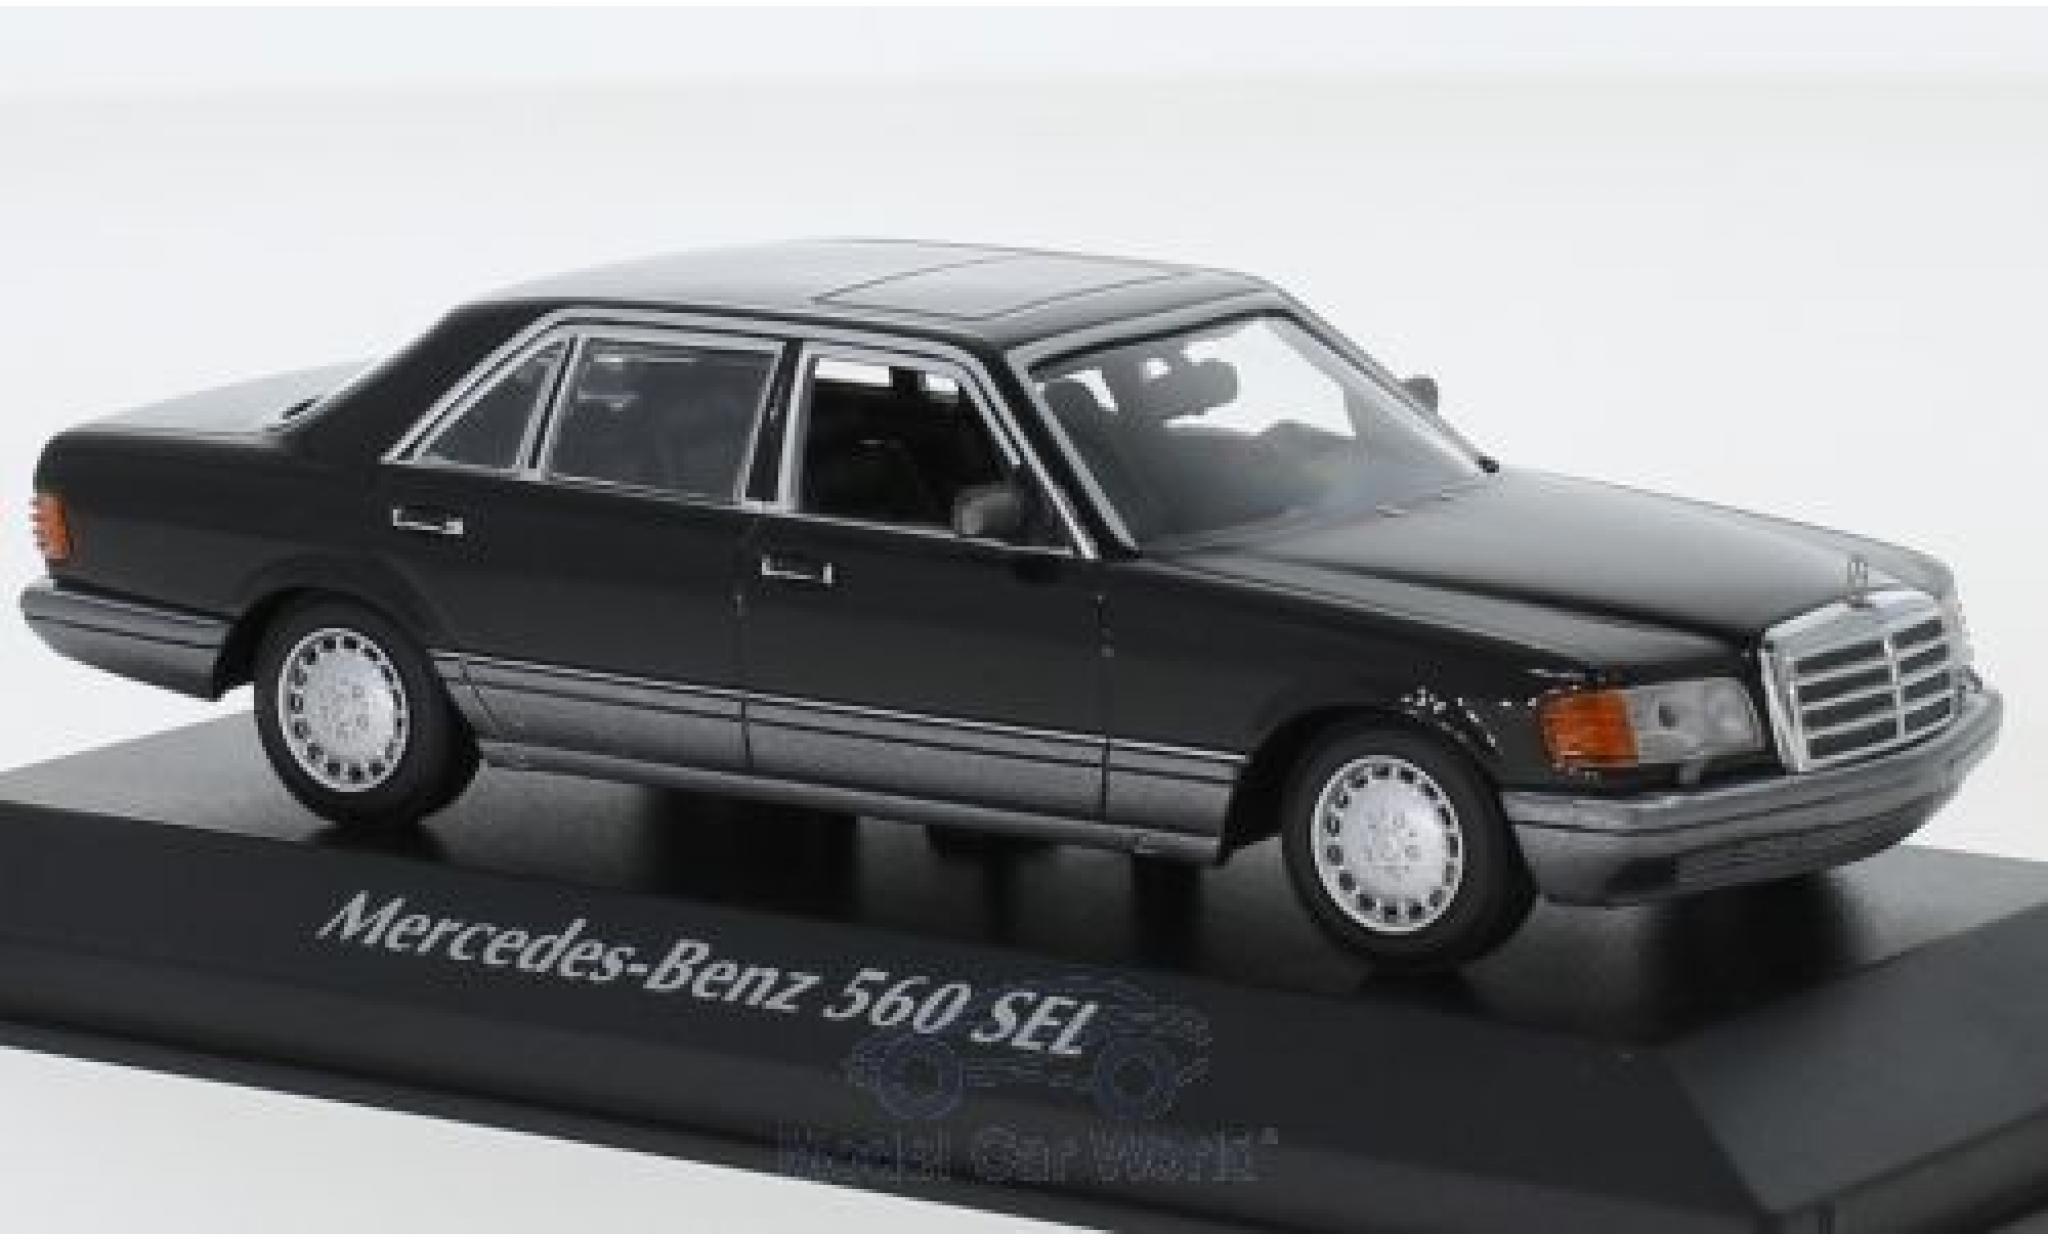 Mercedes 560 1/43 Maxichamps SEL (V126) noire 1990